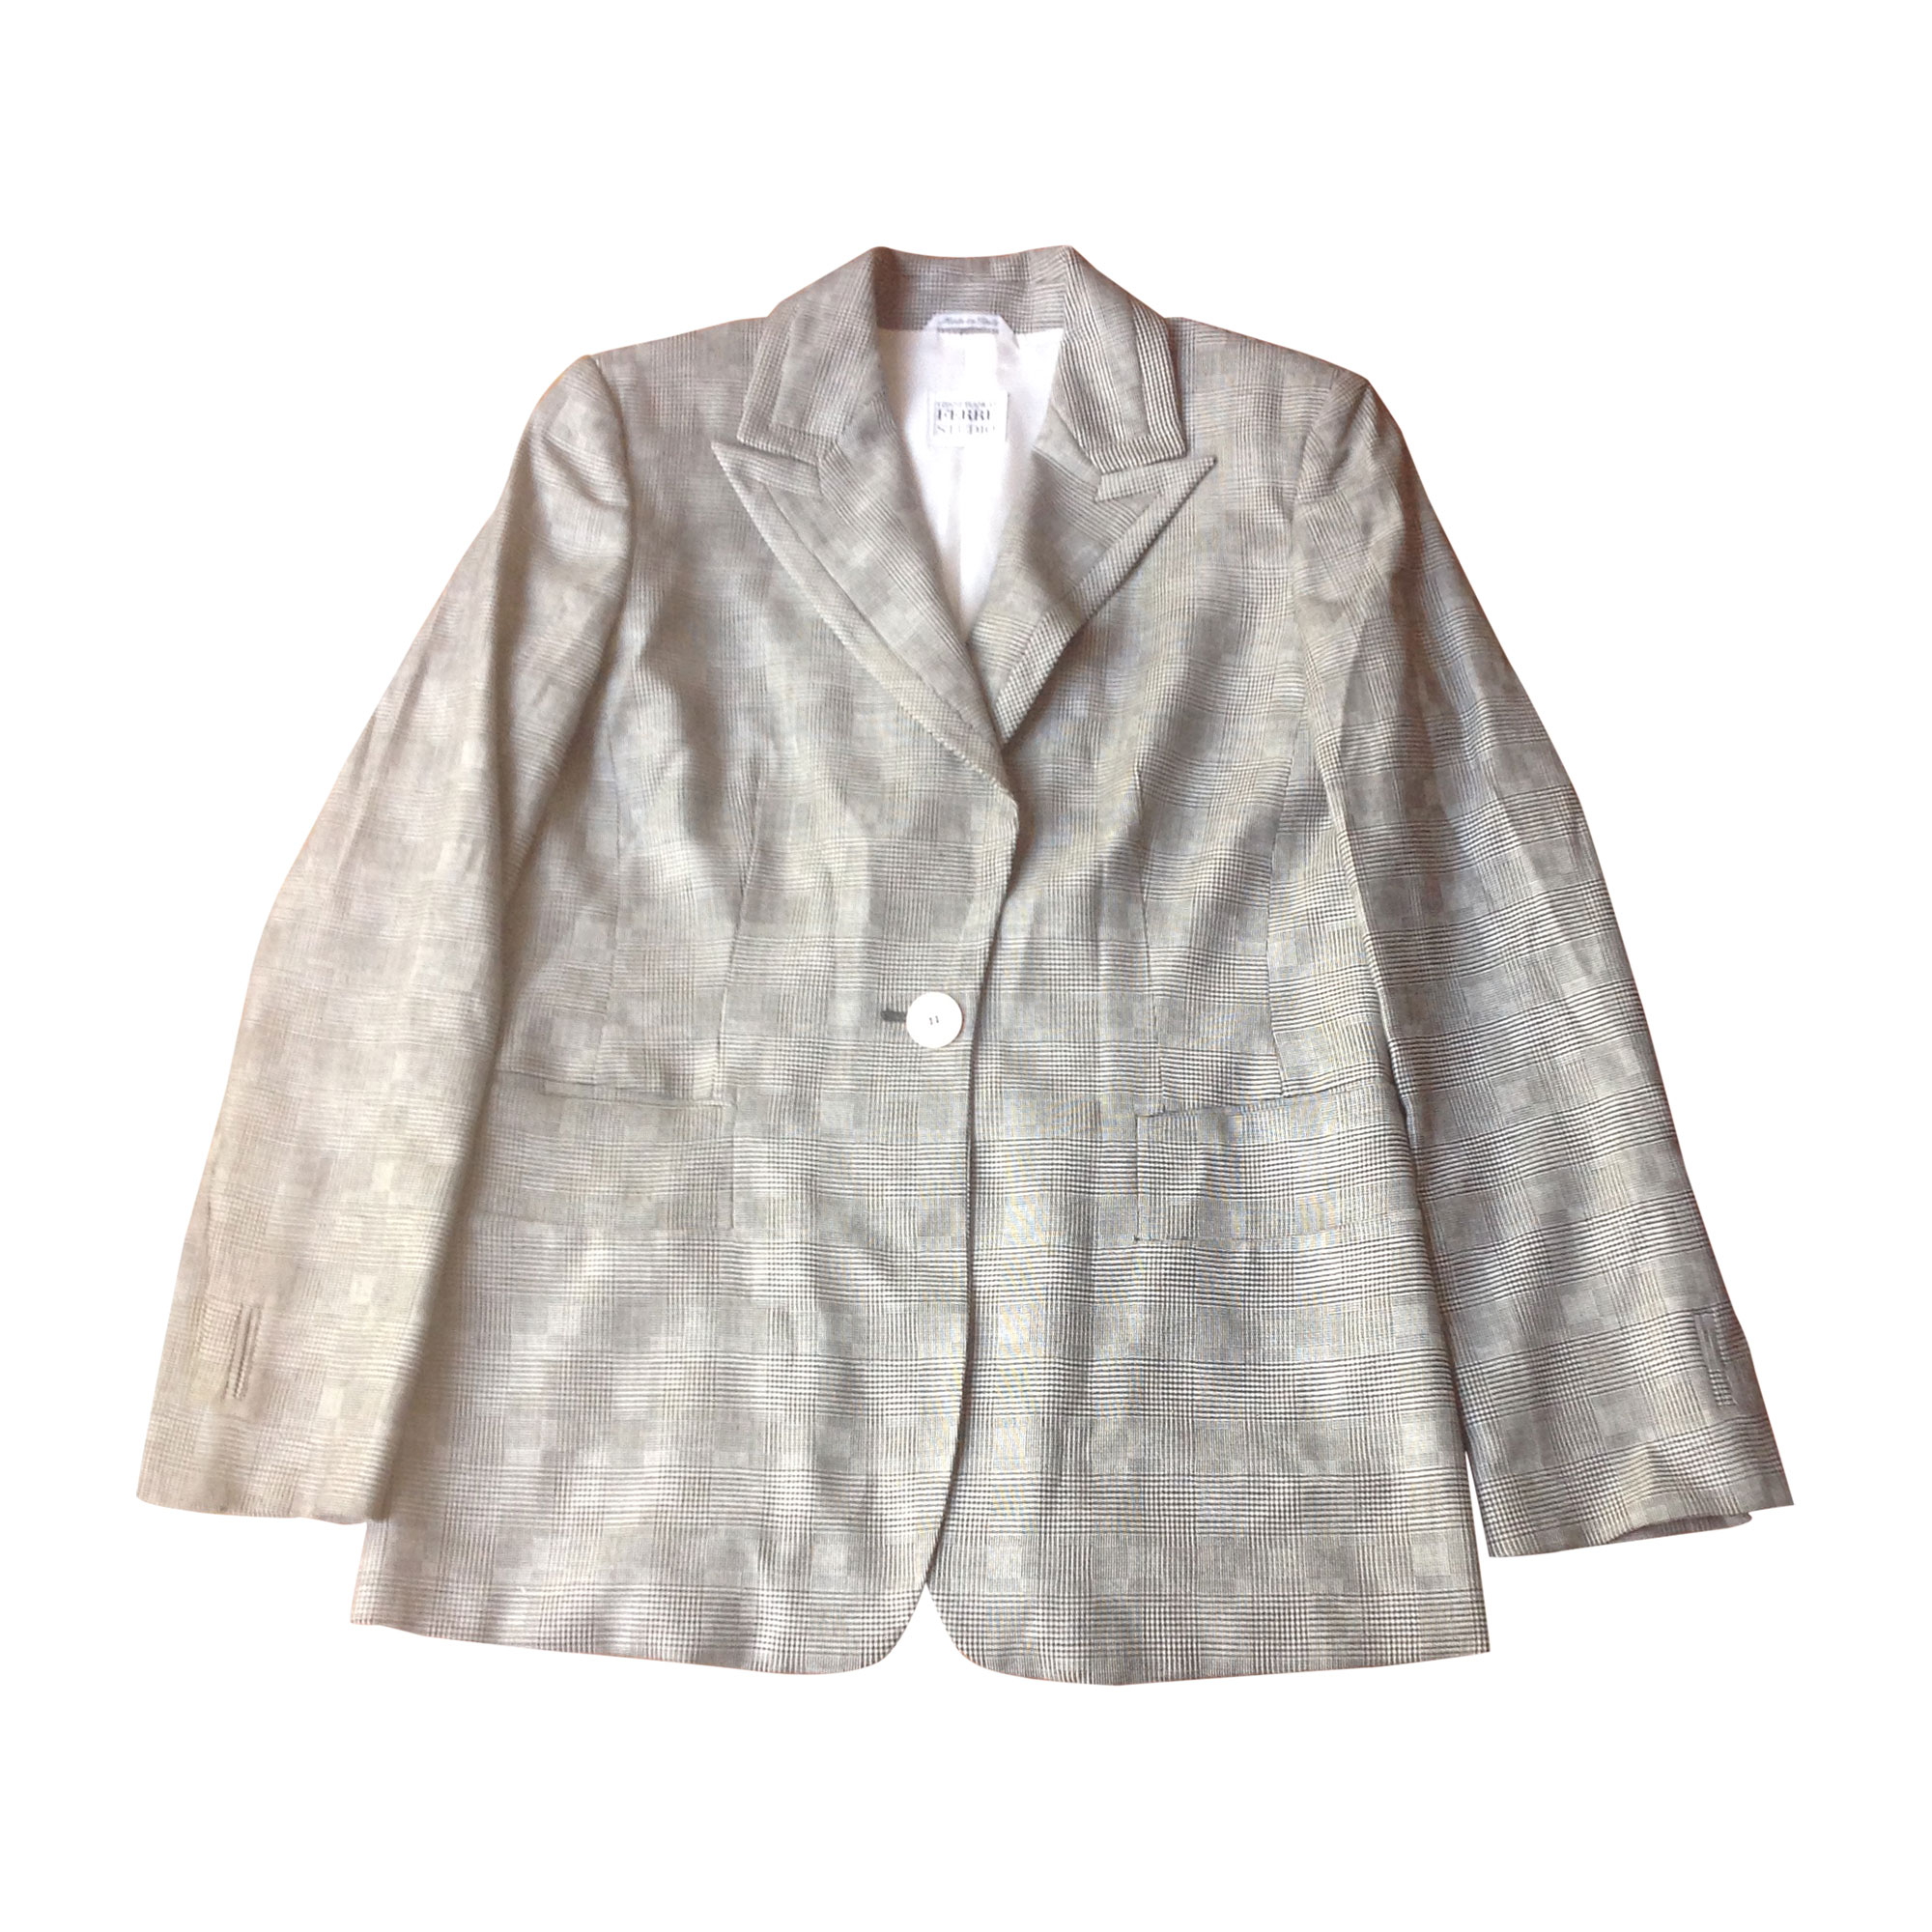 Blazer, veste tailleur GIANFRANCO FERRE Multicouleur